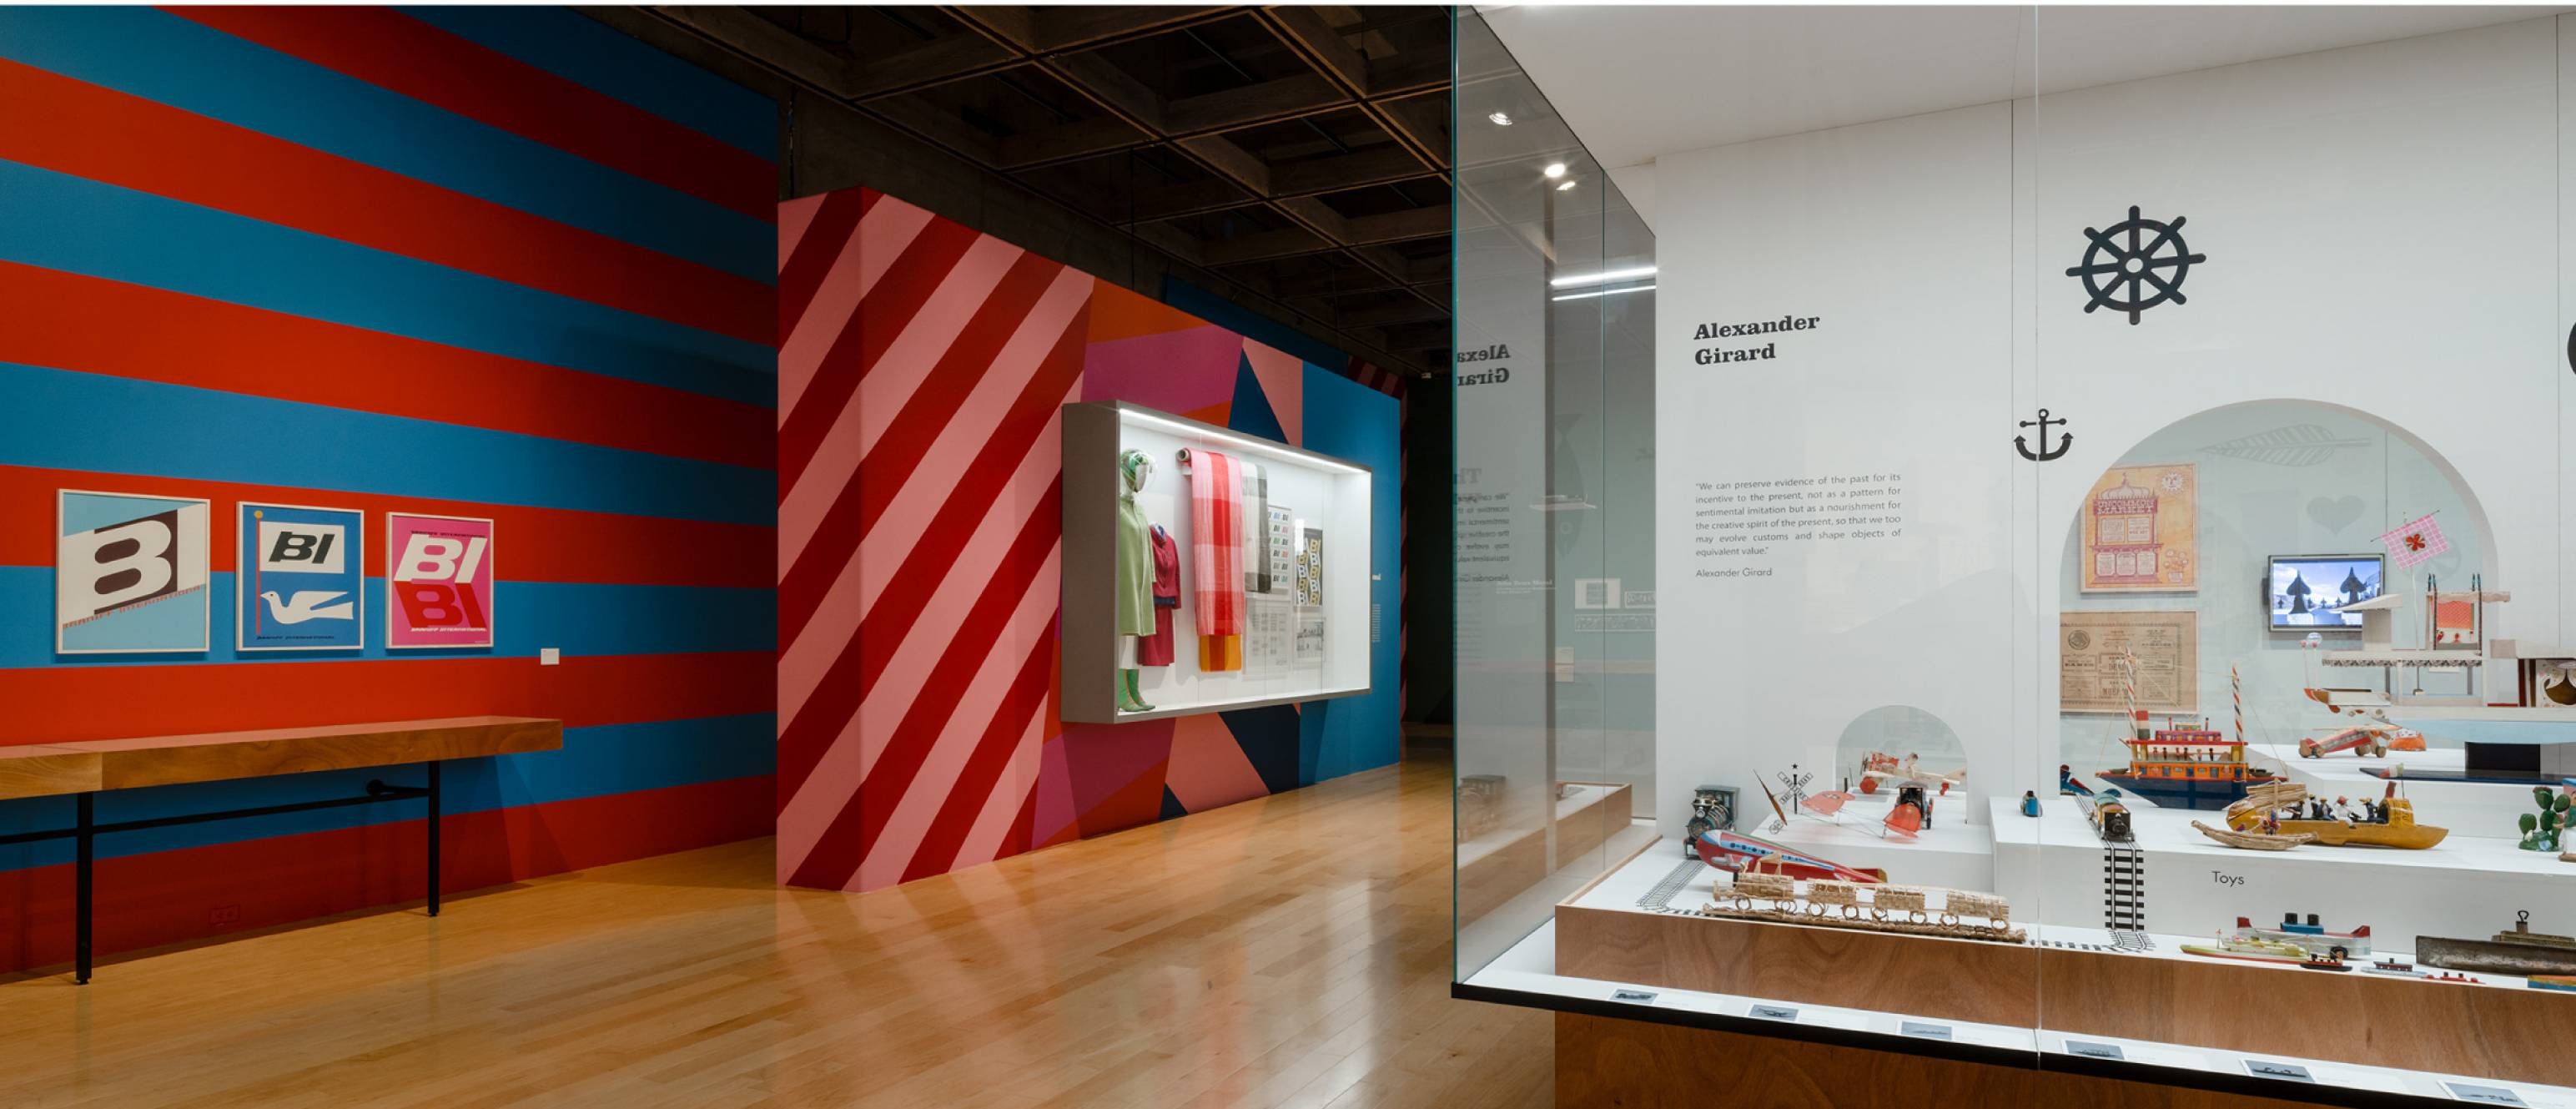 Alexander Girard exhibition, Braniff designs and Folk art collection